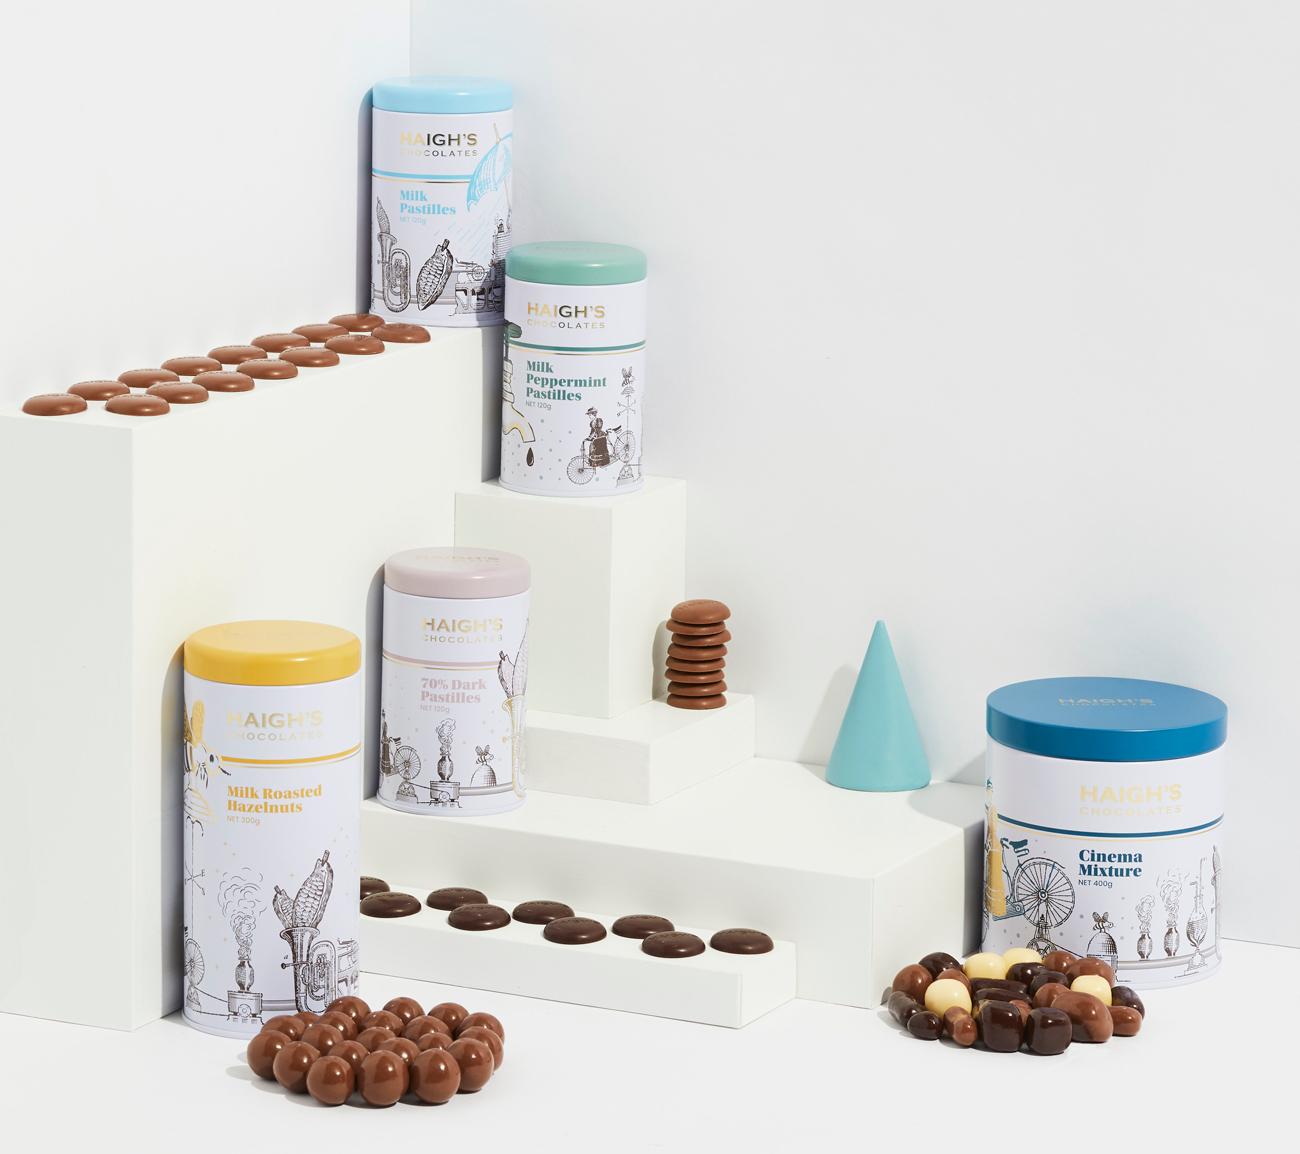 hai-packaging-gift-range-6